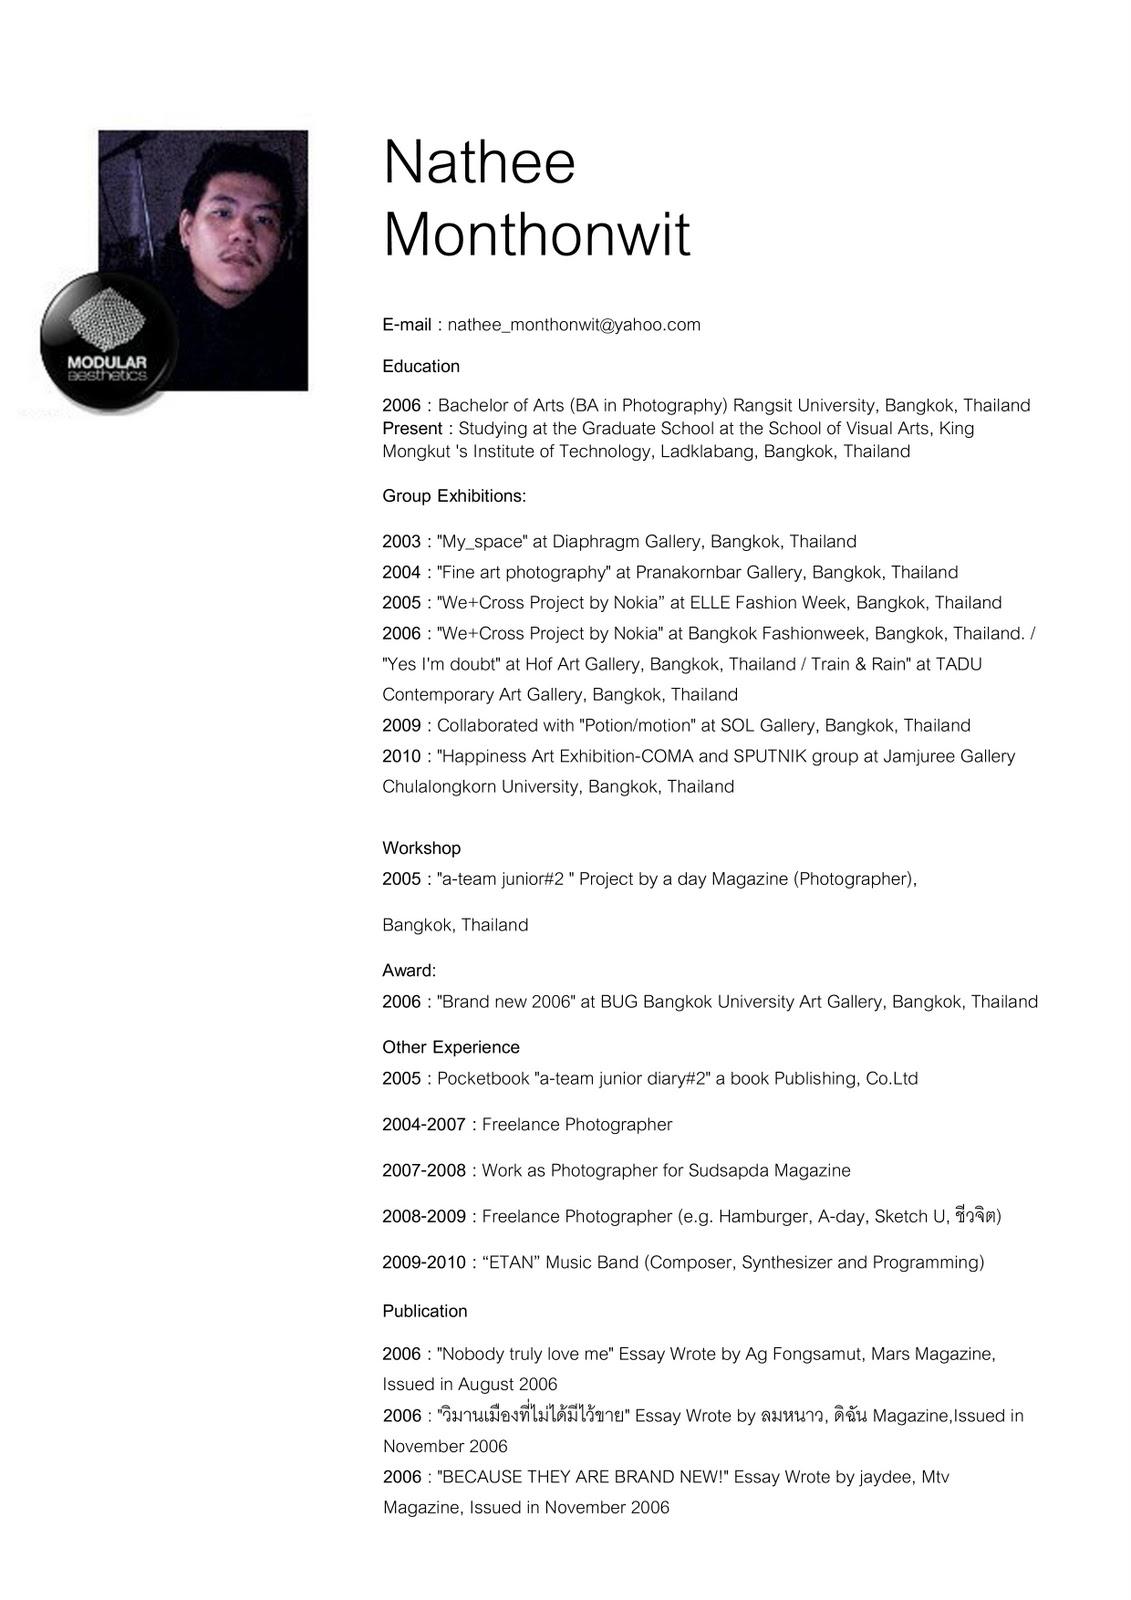 Cv Resume Nisan 2014